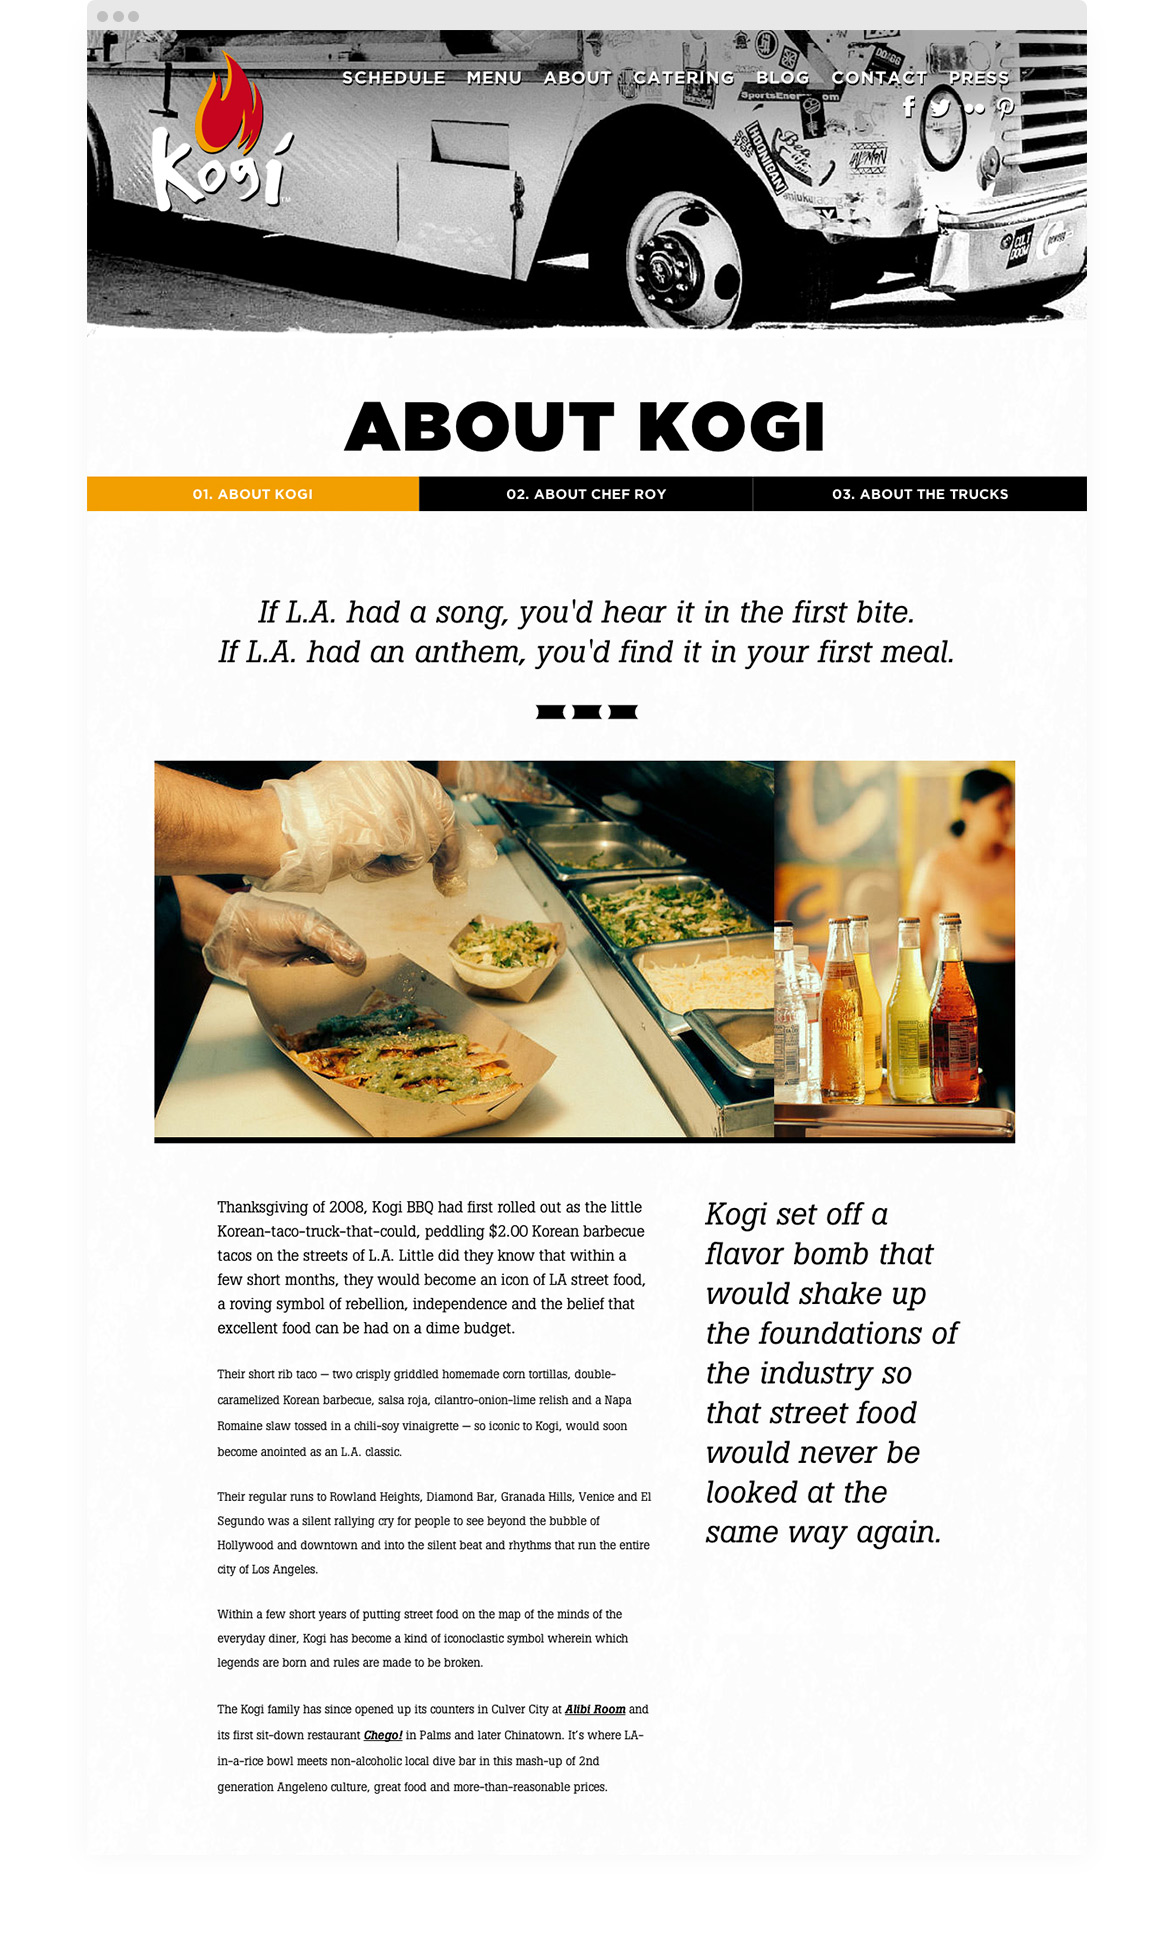 Kymera - Kogi BBQ